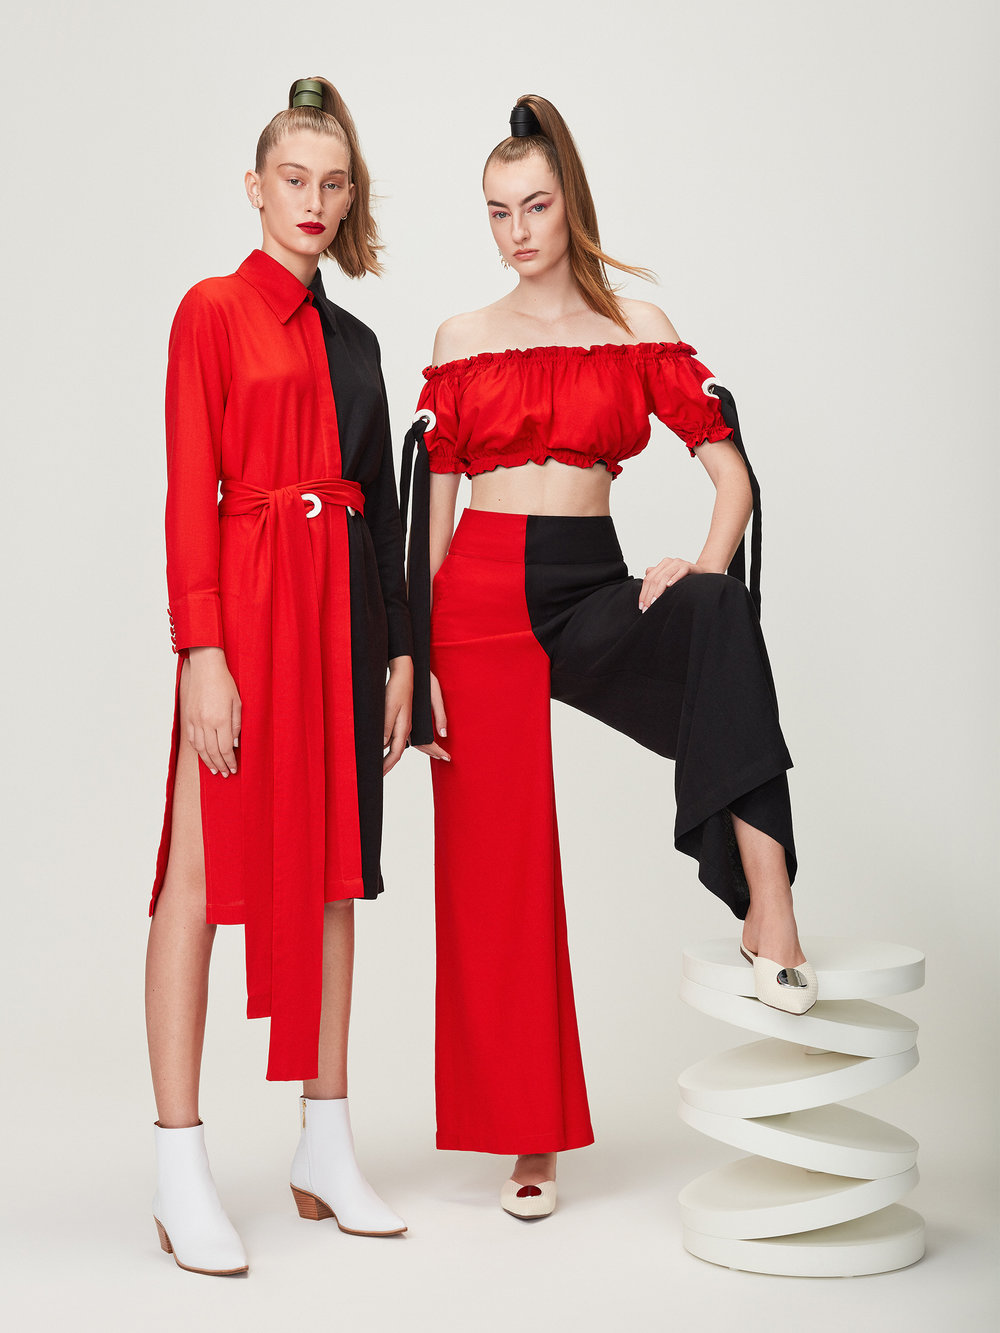 Vogue - Karol and Karla